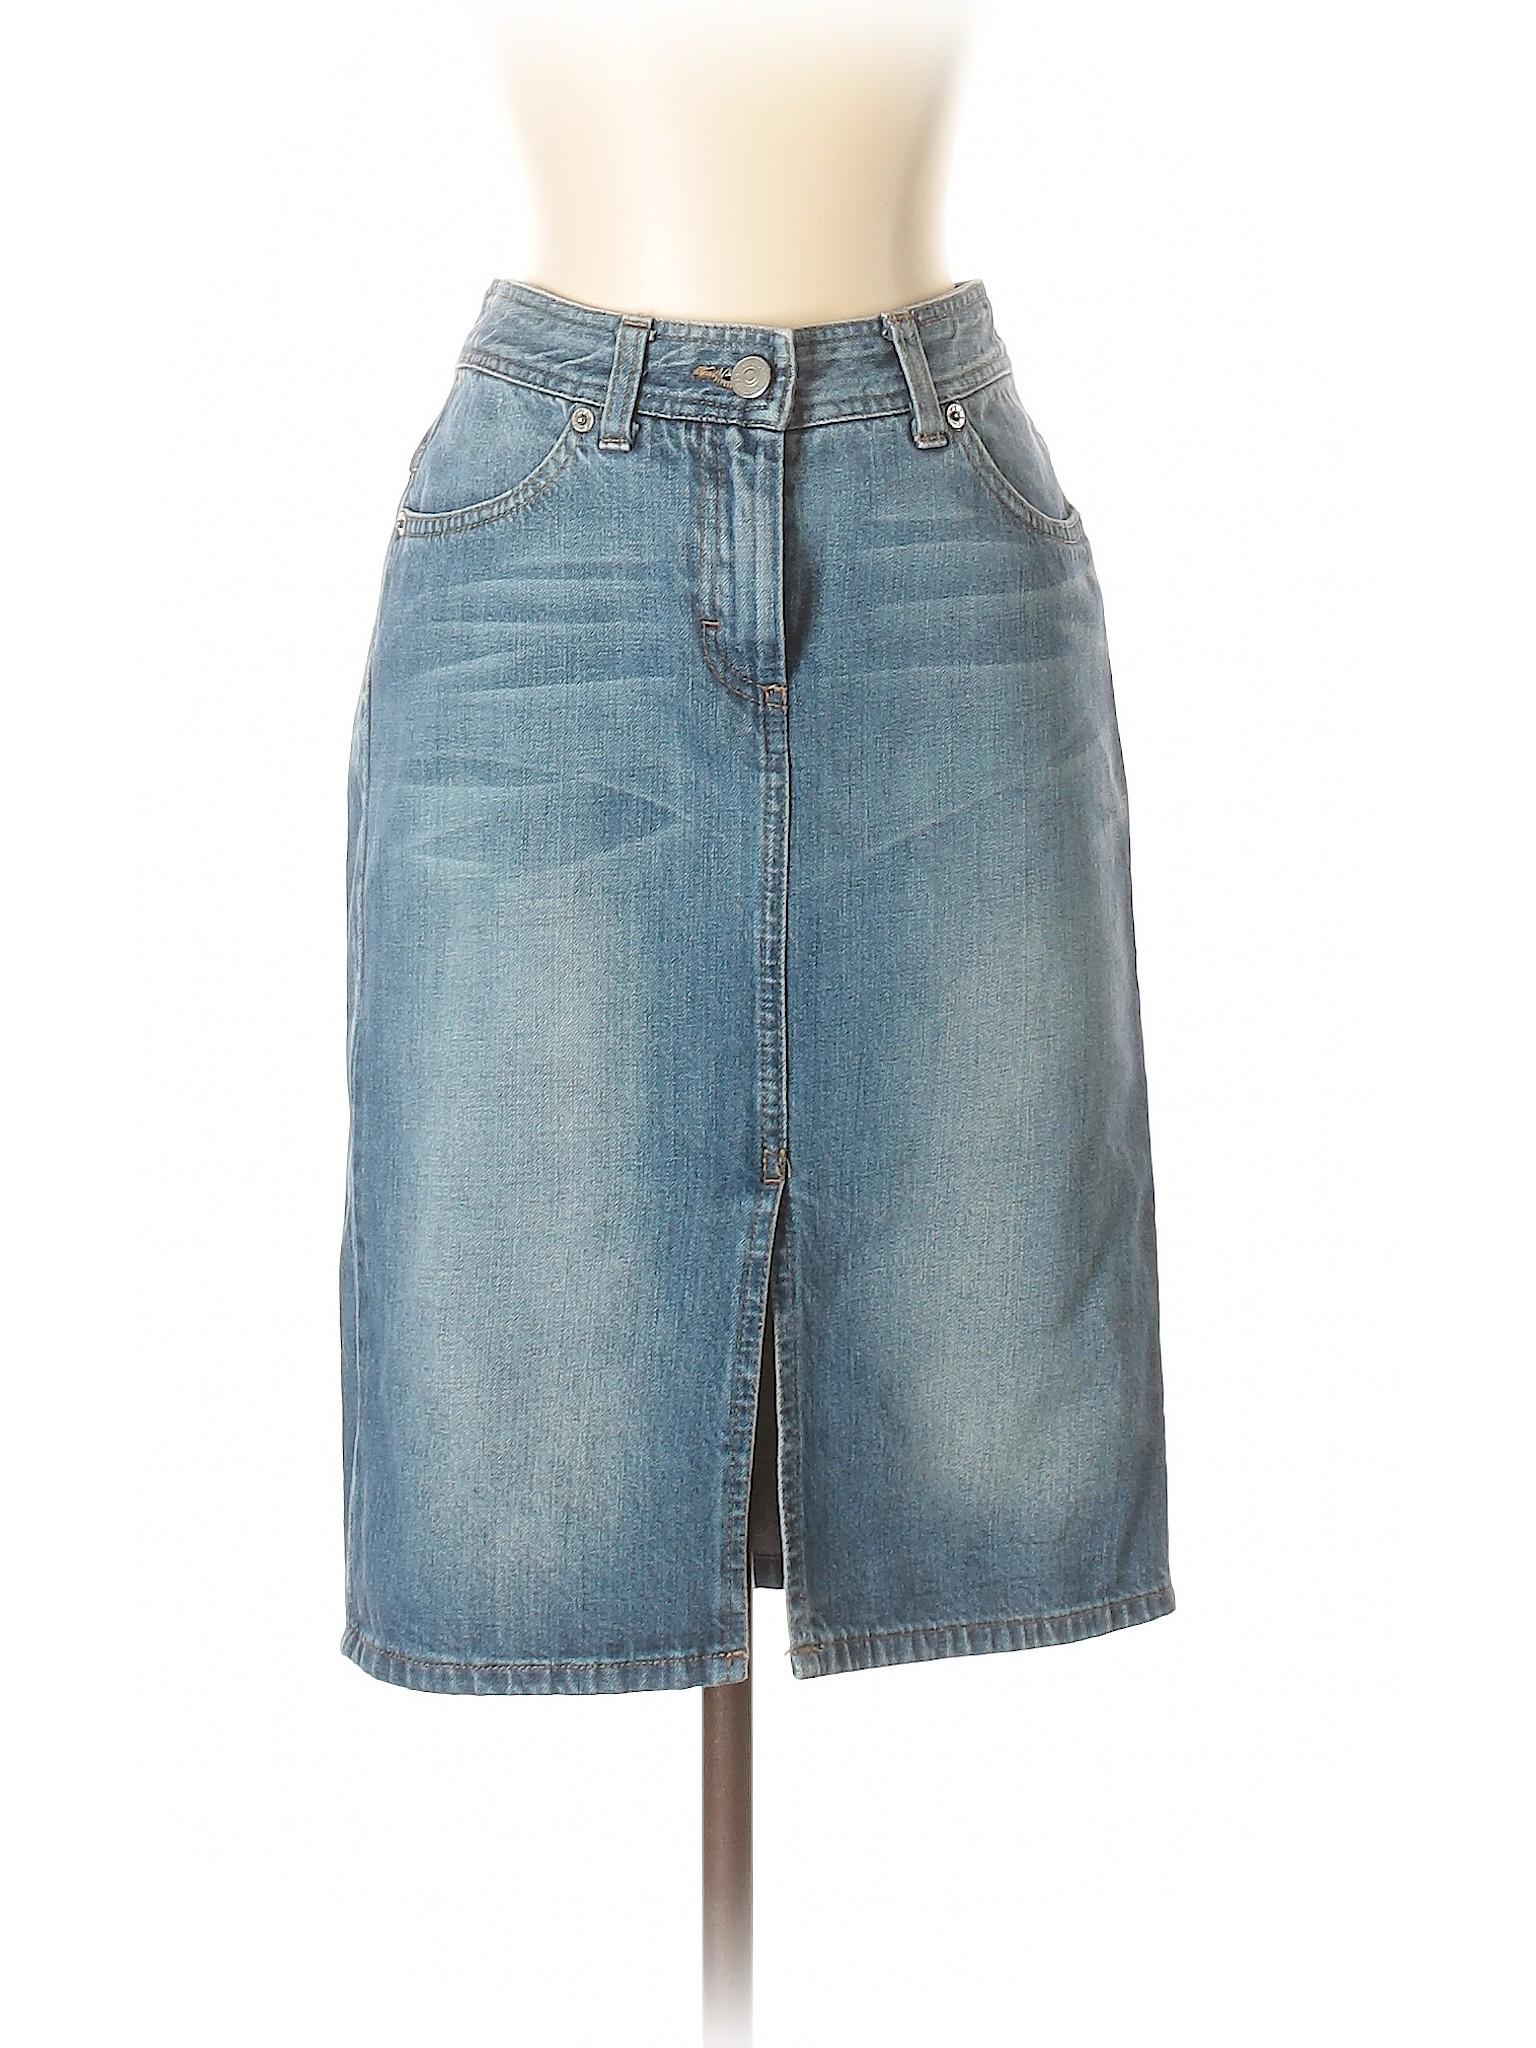 Skirt Boutique Boutique Denim Boutique Denim Skirt Denim Boutique Skirt Denim Skirt Boutique 8OHSq